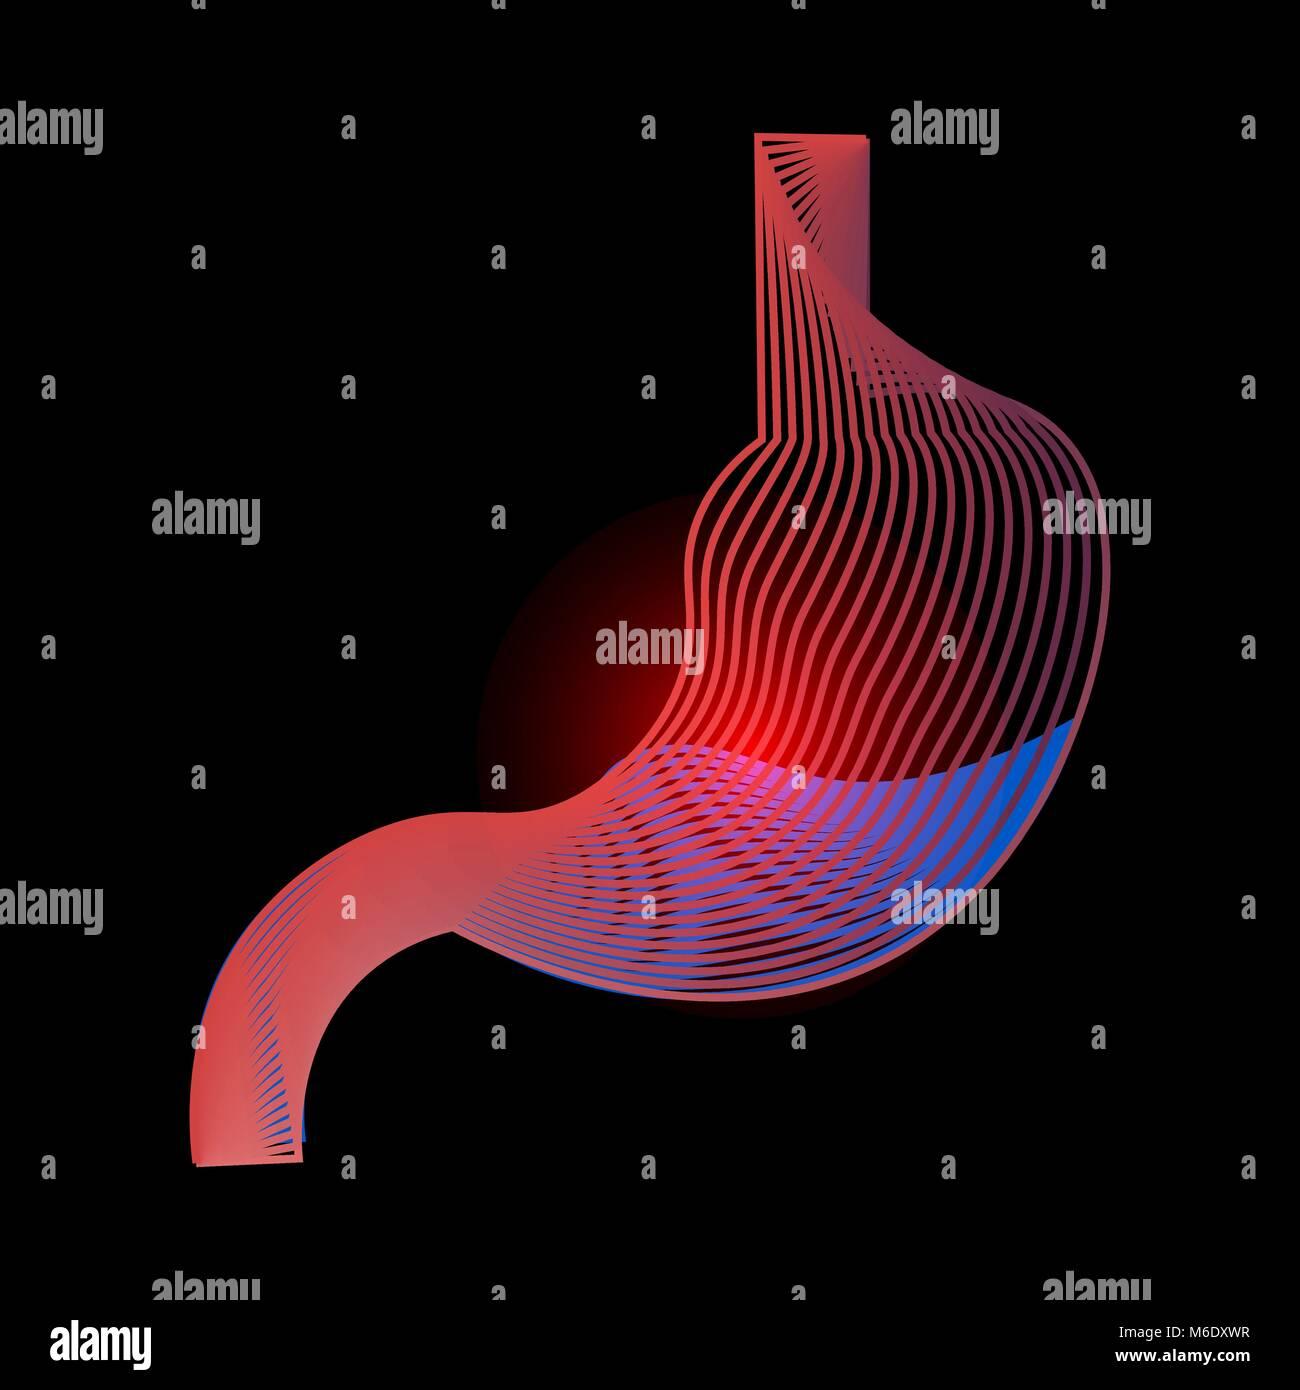 Stomach Icon Human Internal Organs Symbol Digestive System Stock